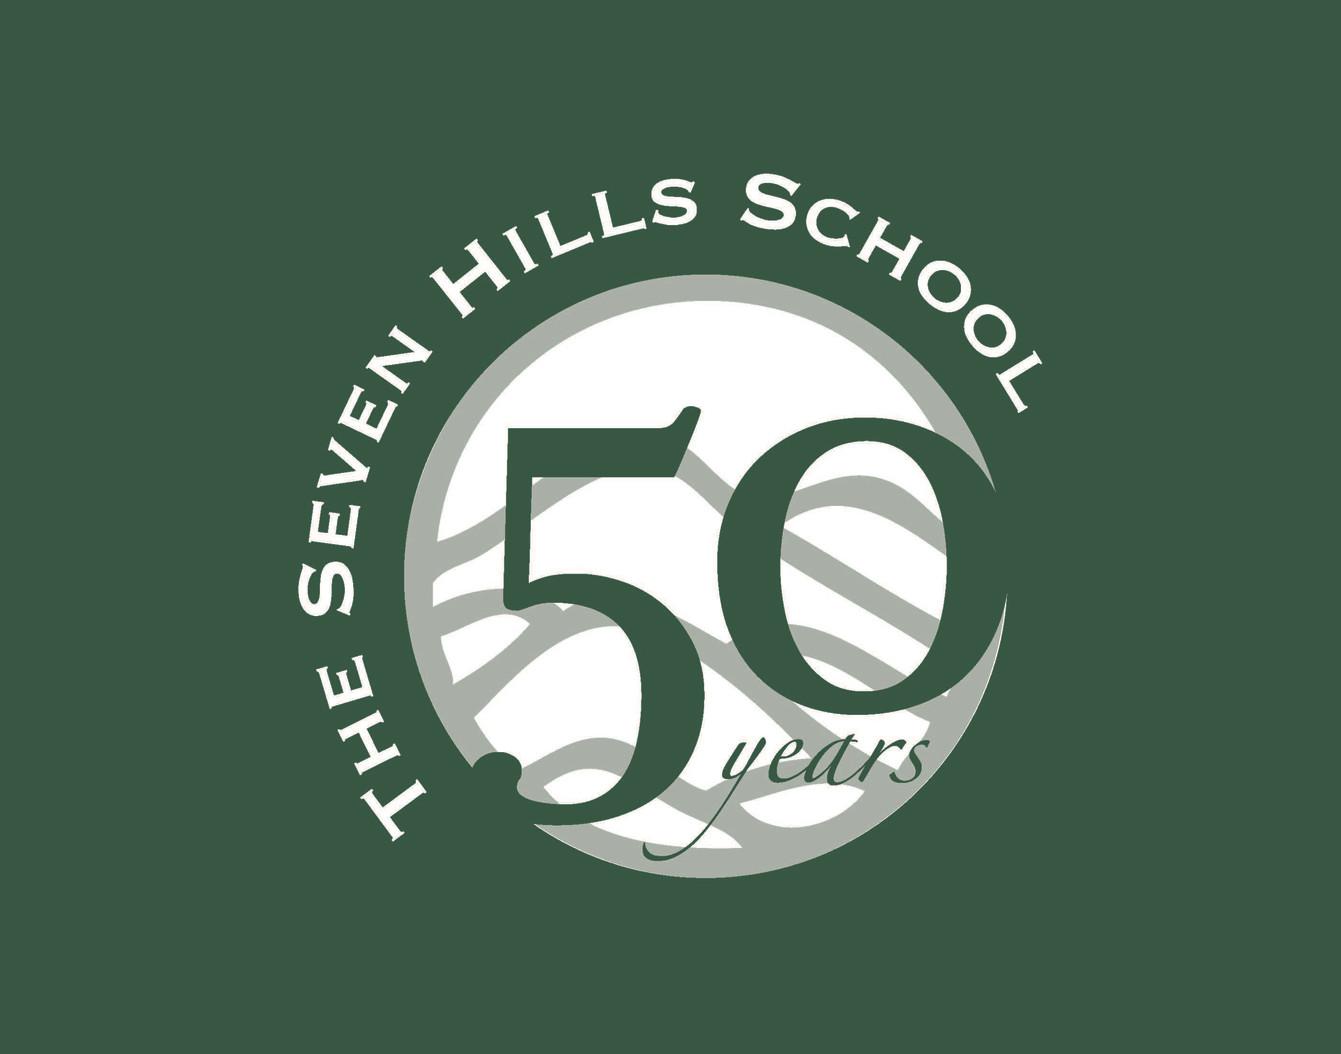 50th Anniversary Logo for Seven Hills School